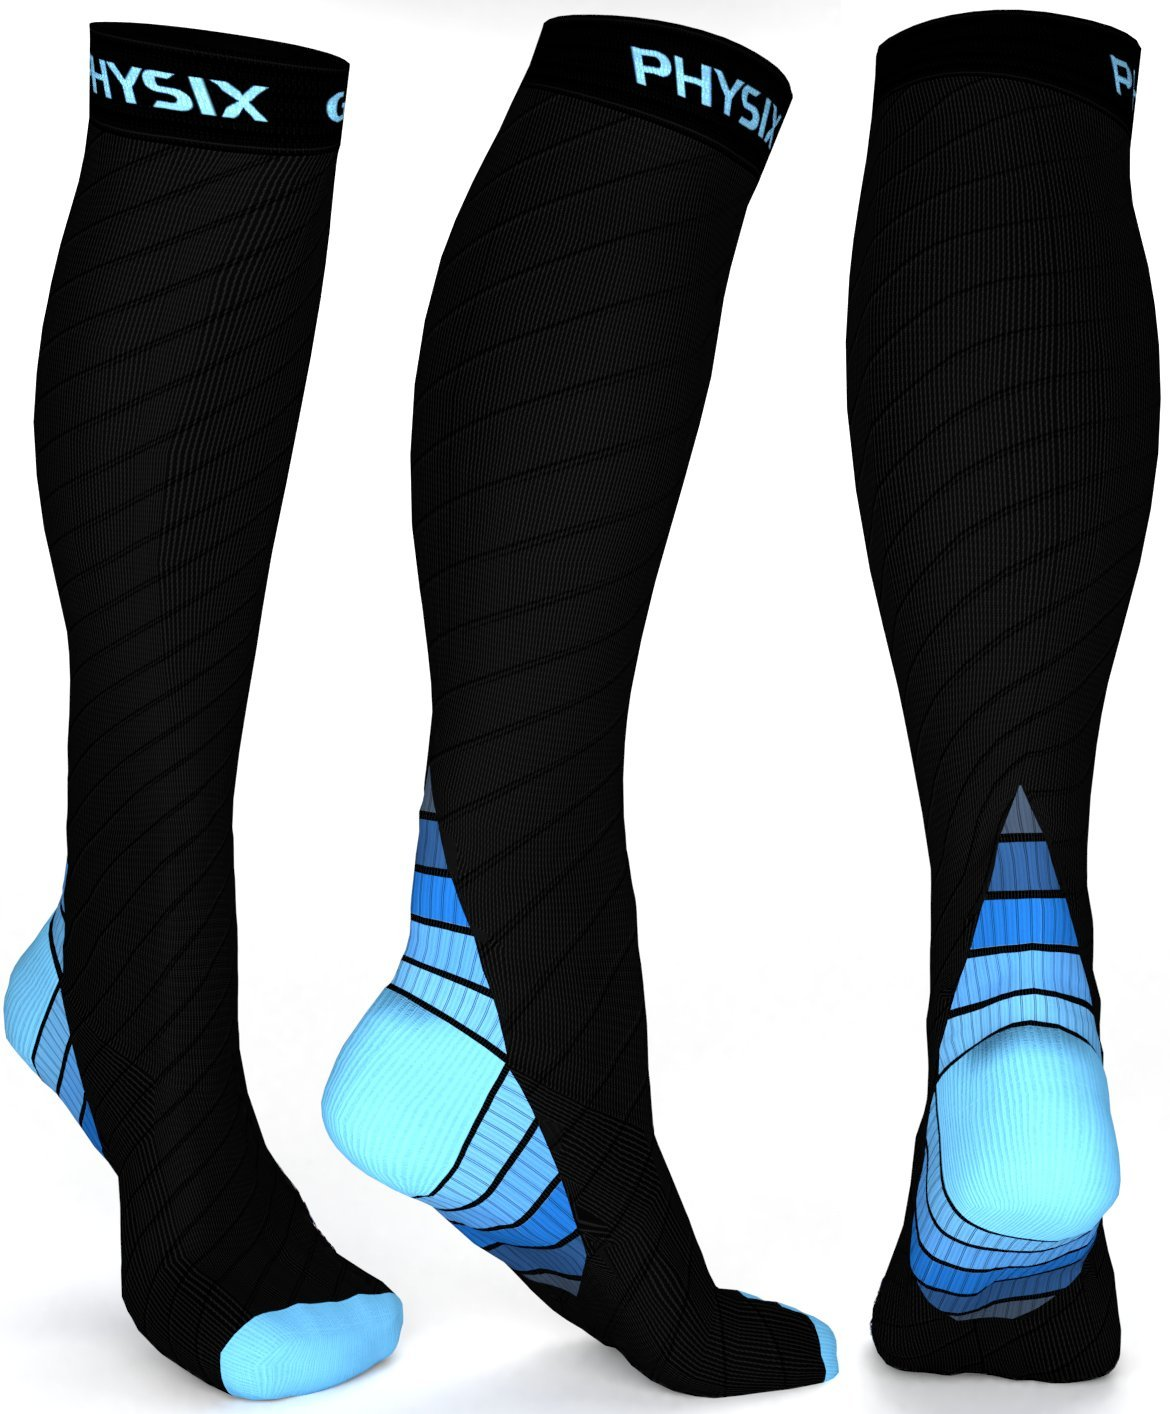 Physix Gear Compression Socks for Men & Women (20 - 30 mmhg) Best Graduated Athletic Fit for Running, Nurses, Shin Splints, Flight Travel & Maternity Pregnancy - Boost Stamina, Circulation & Recovery